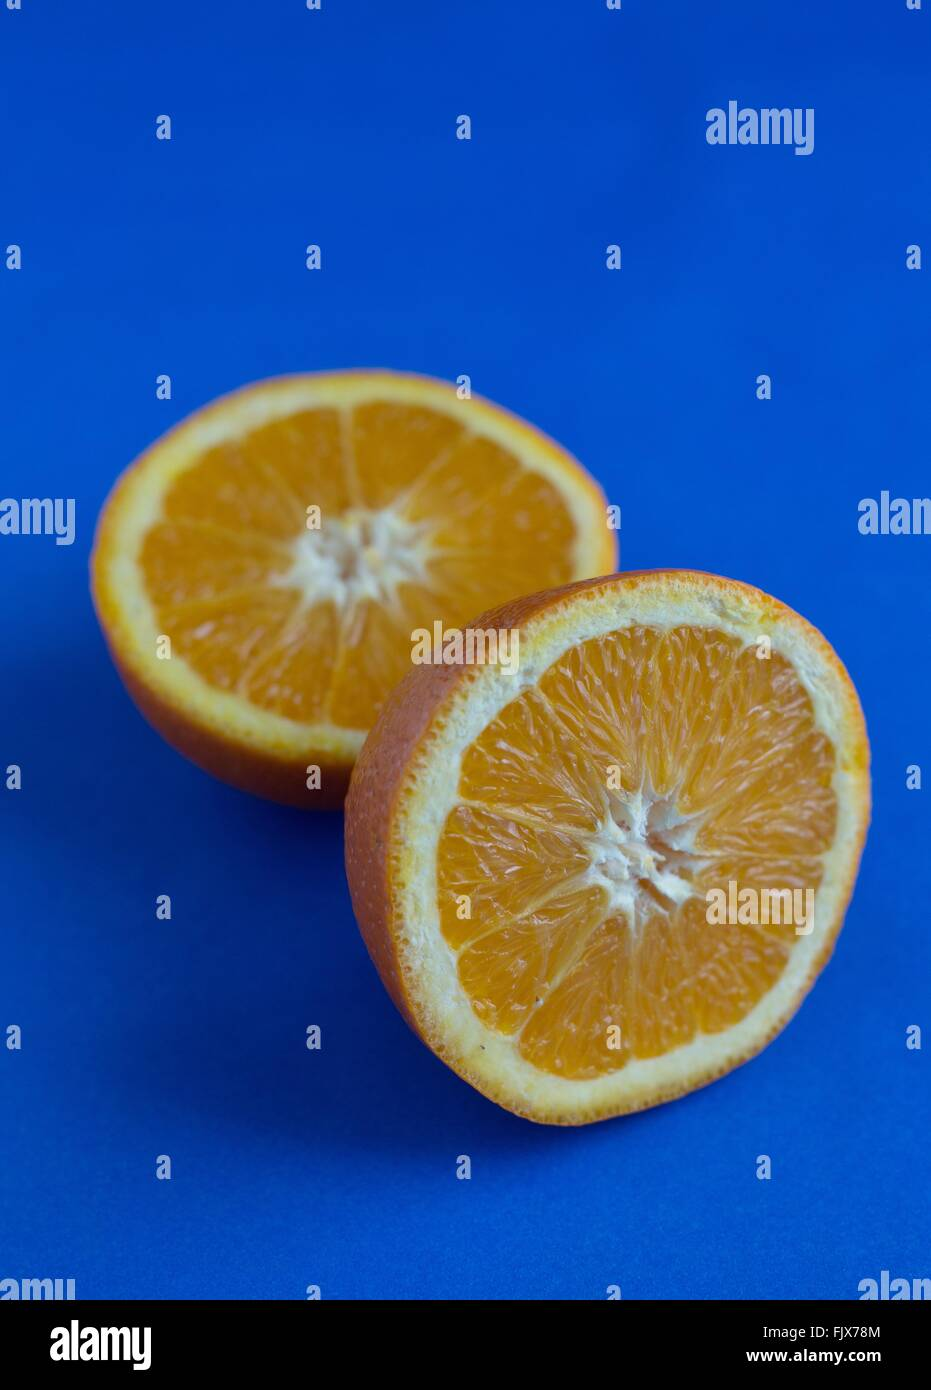 A sliced orange against a blue background. - Stock Image